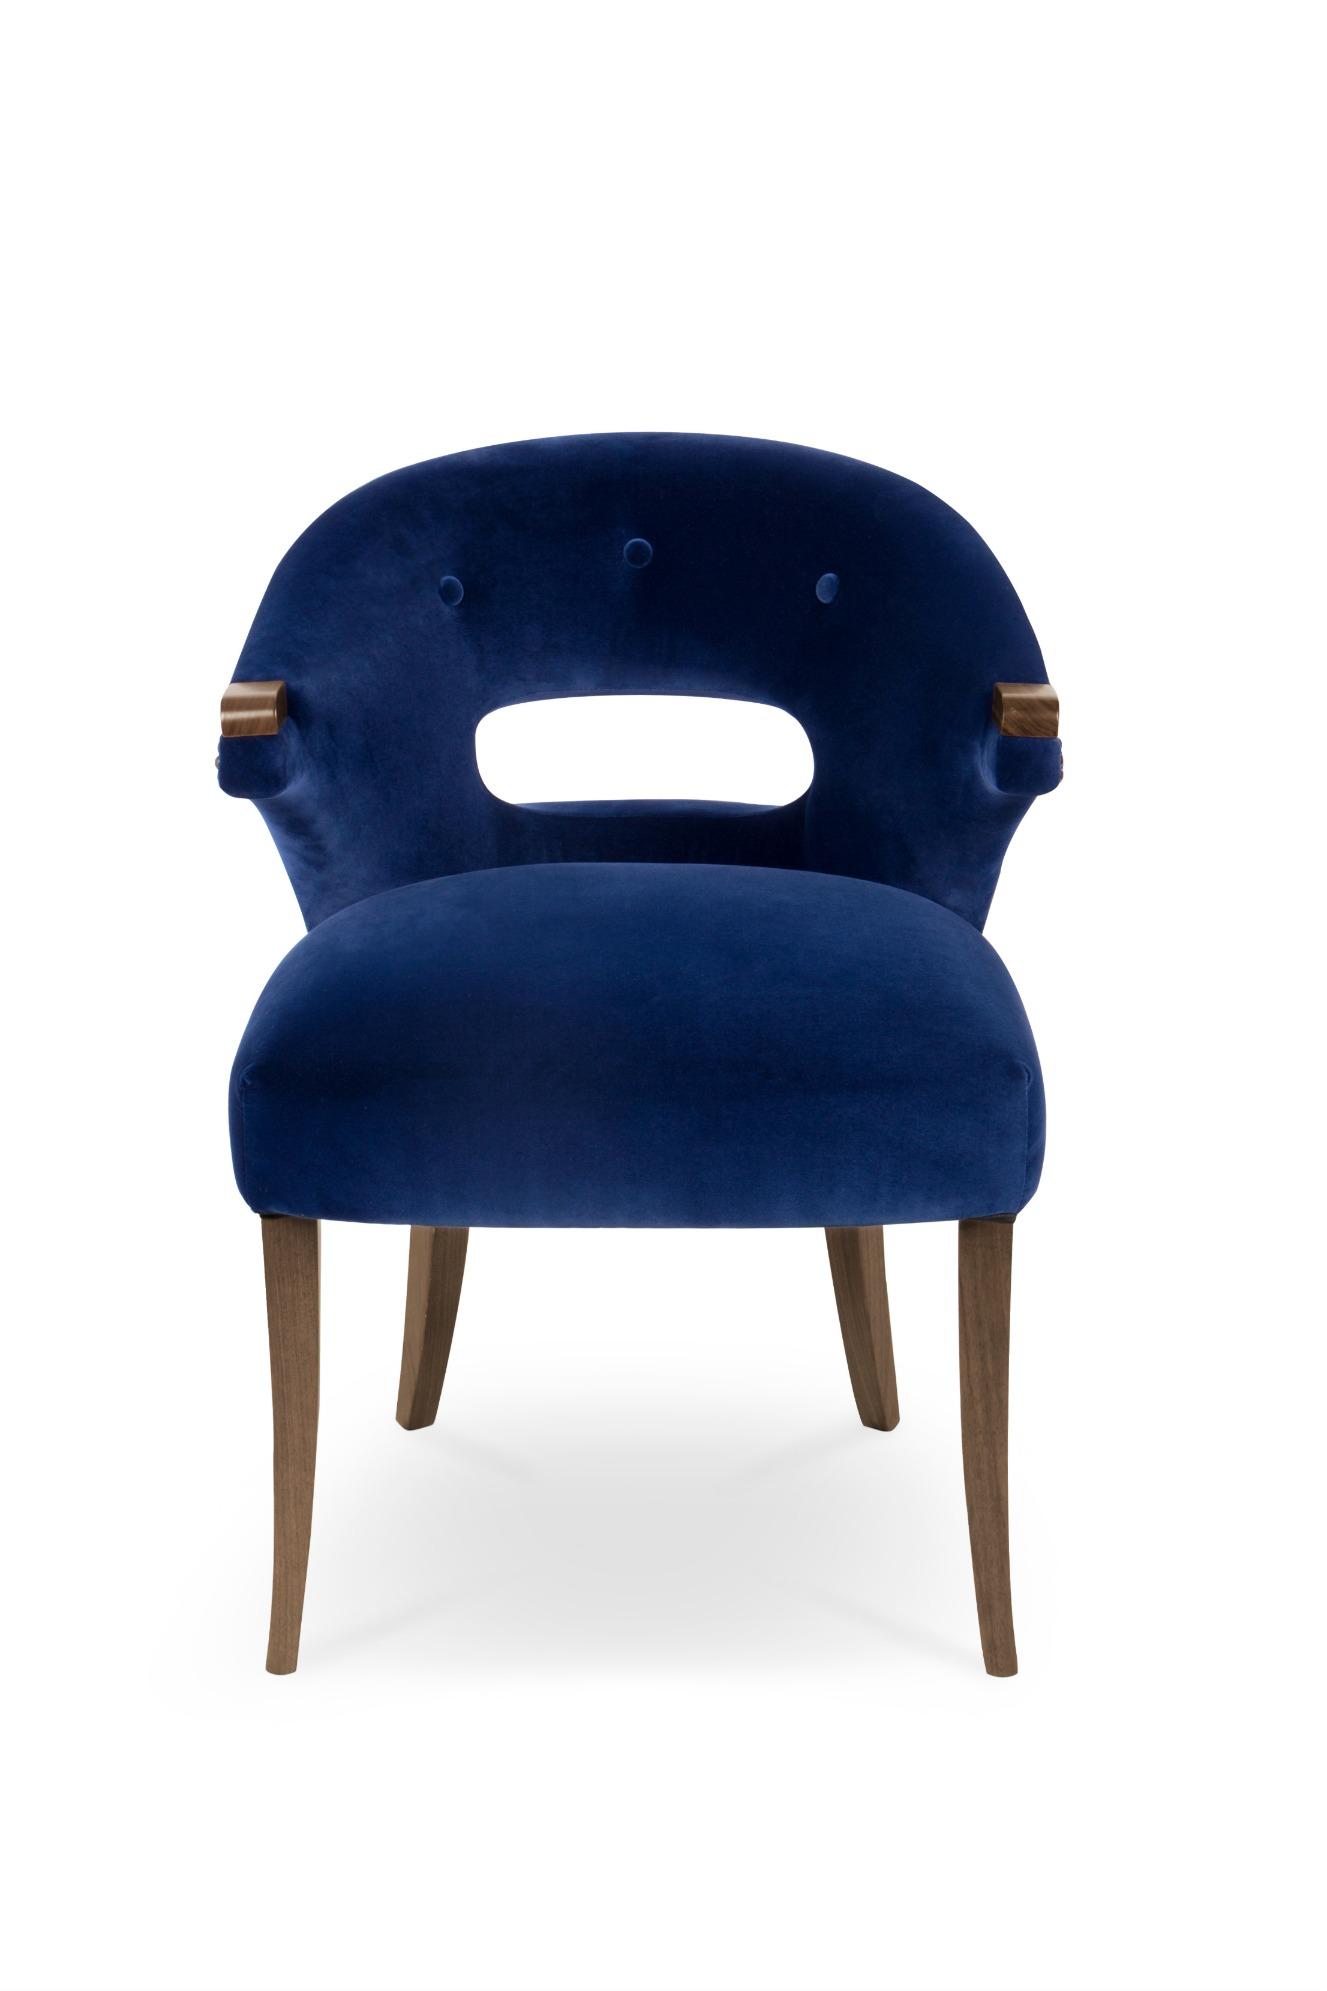 STOLA Dining Chair; Dining Chair; Upholstery; Modern; Sophistication; Elegance; Classiness; Comfort; Fierceness; BRABBU; Design; Furniture stola dining chairSTOLA Dining Chair: A Symbol of Elegance and Sophisticationnanook dining chair 1 HR